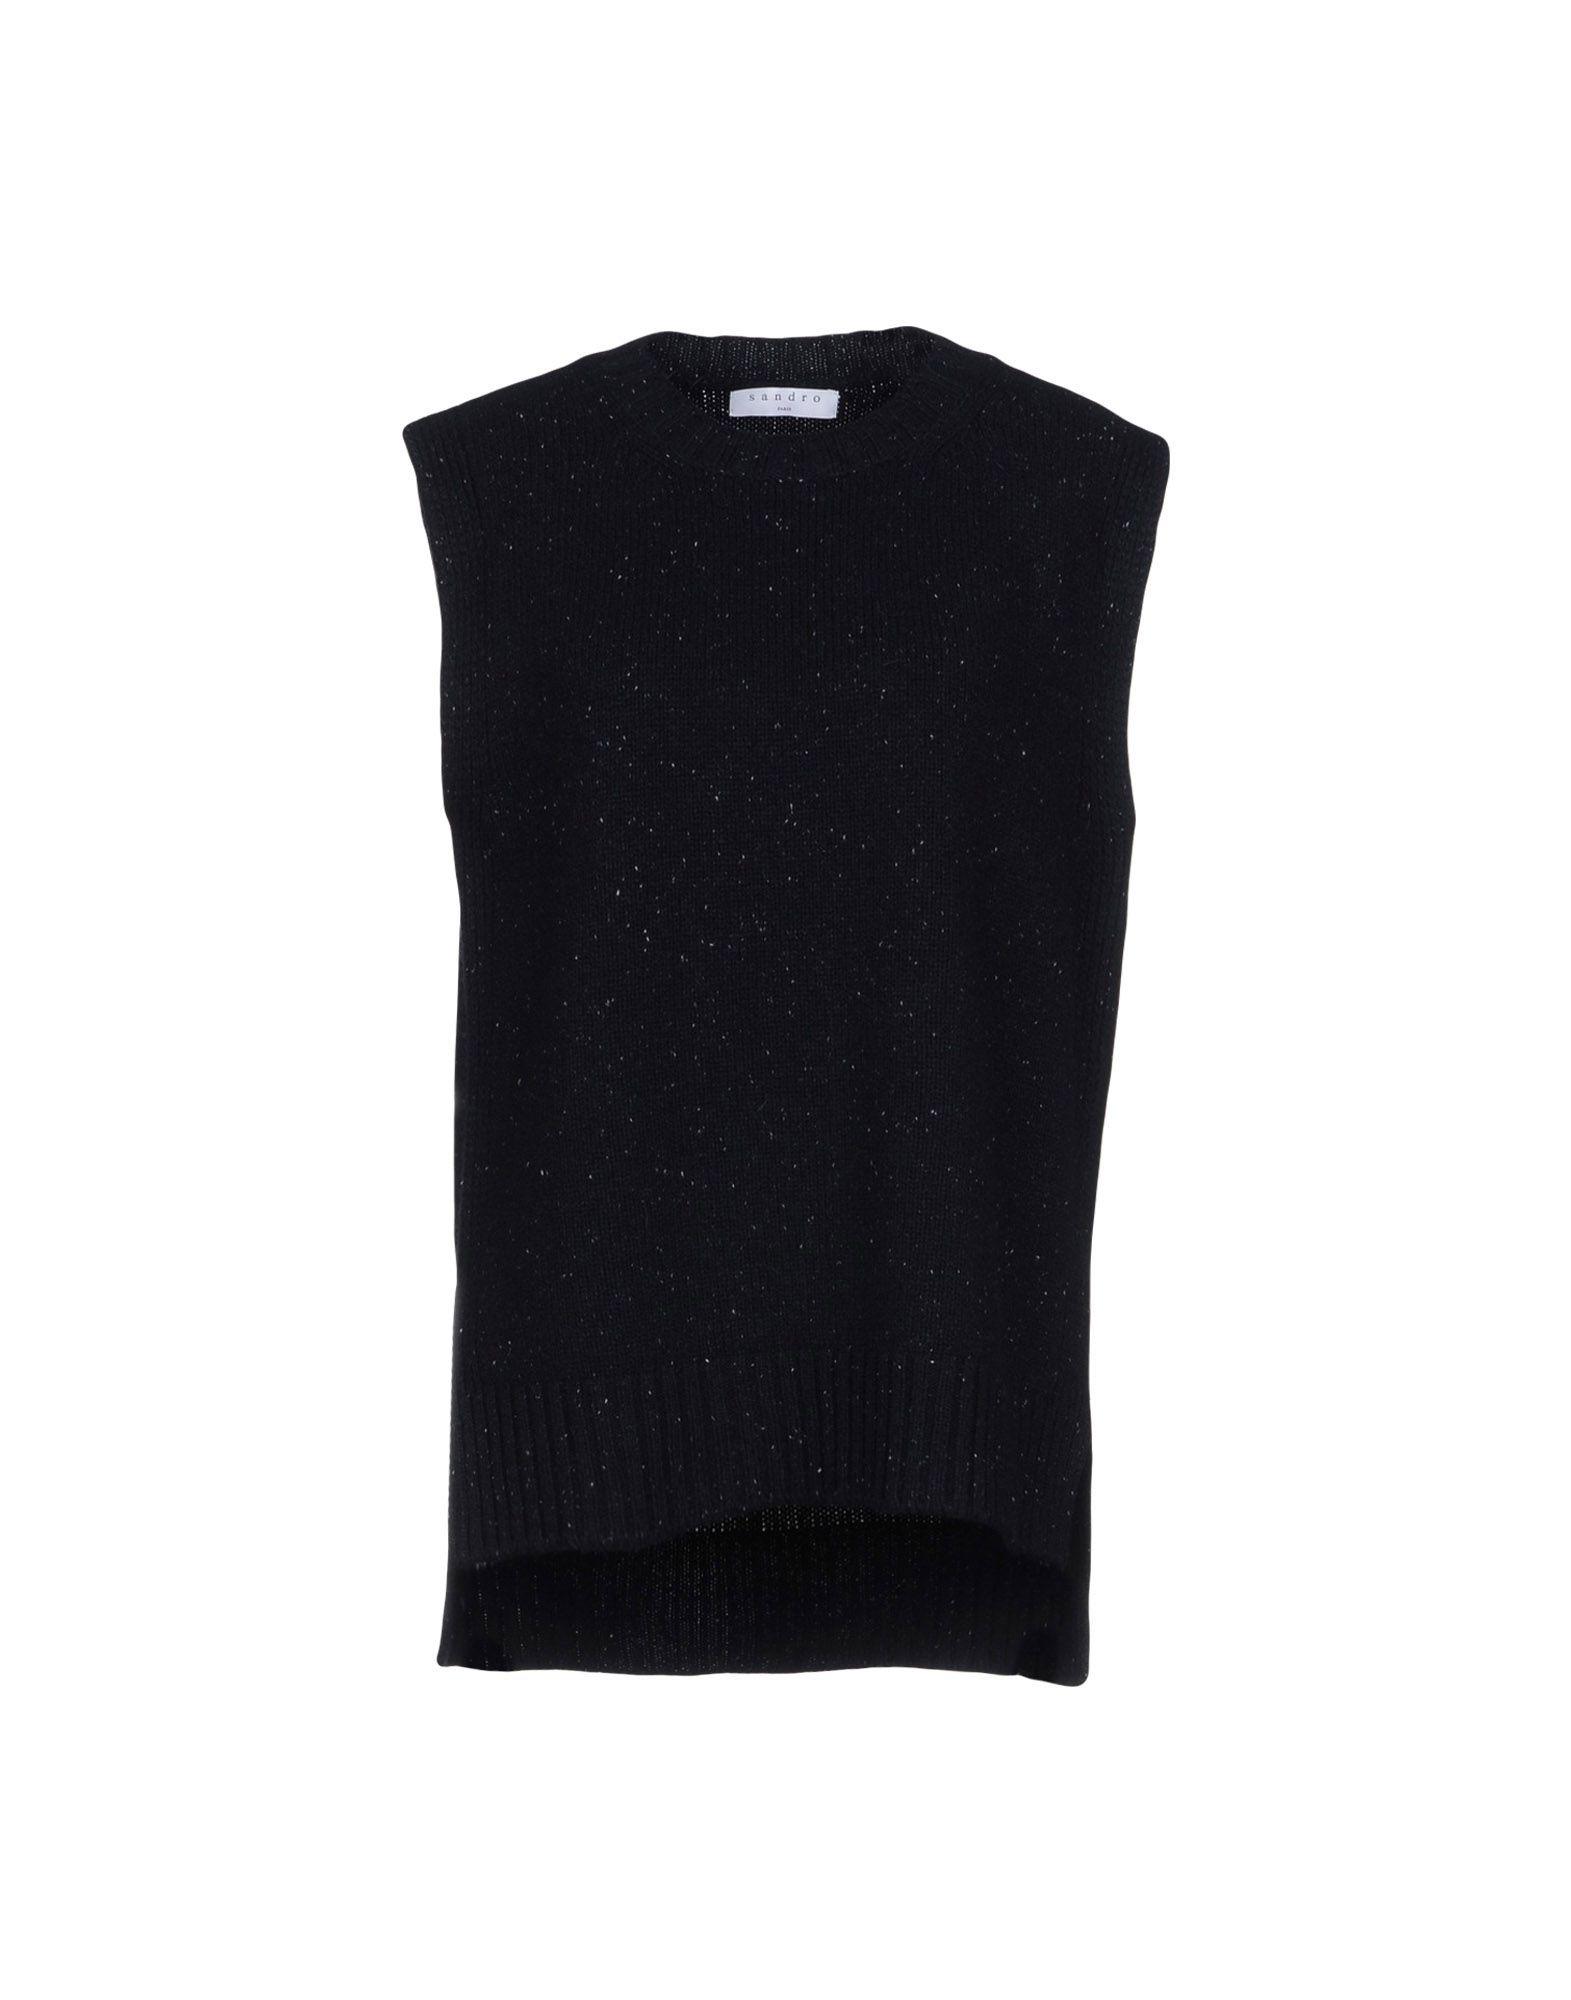 SANDRO PARIS Sweater in Dark Blue